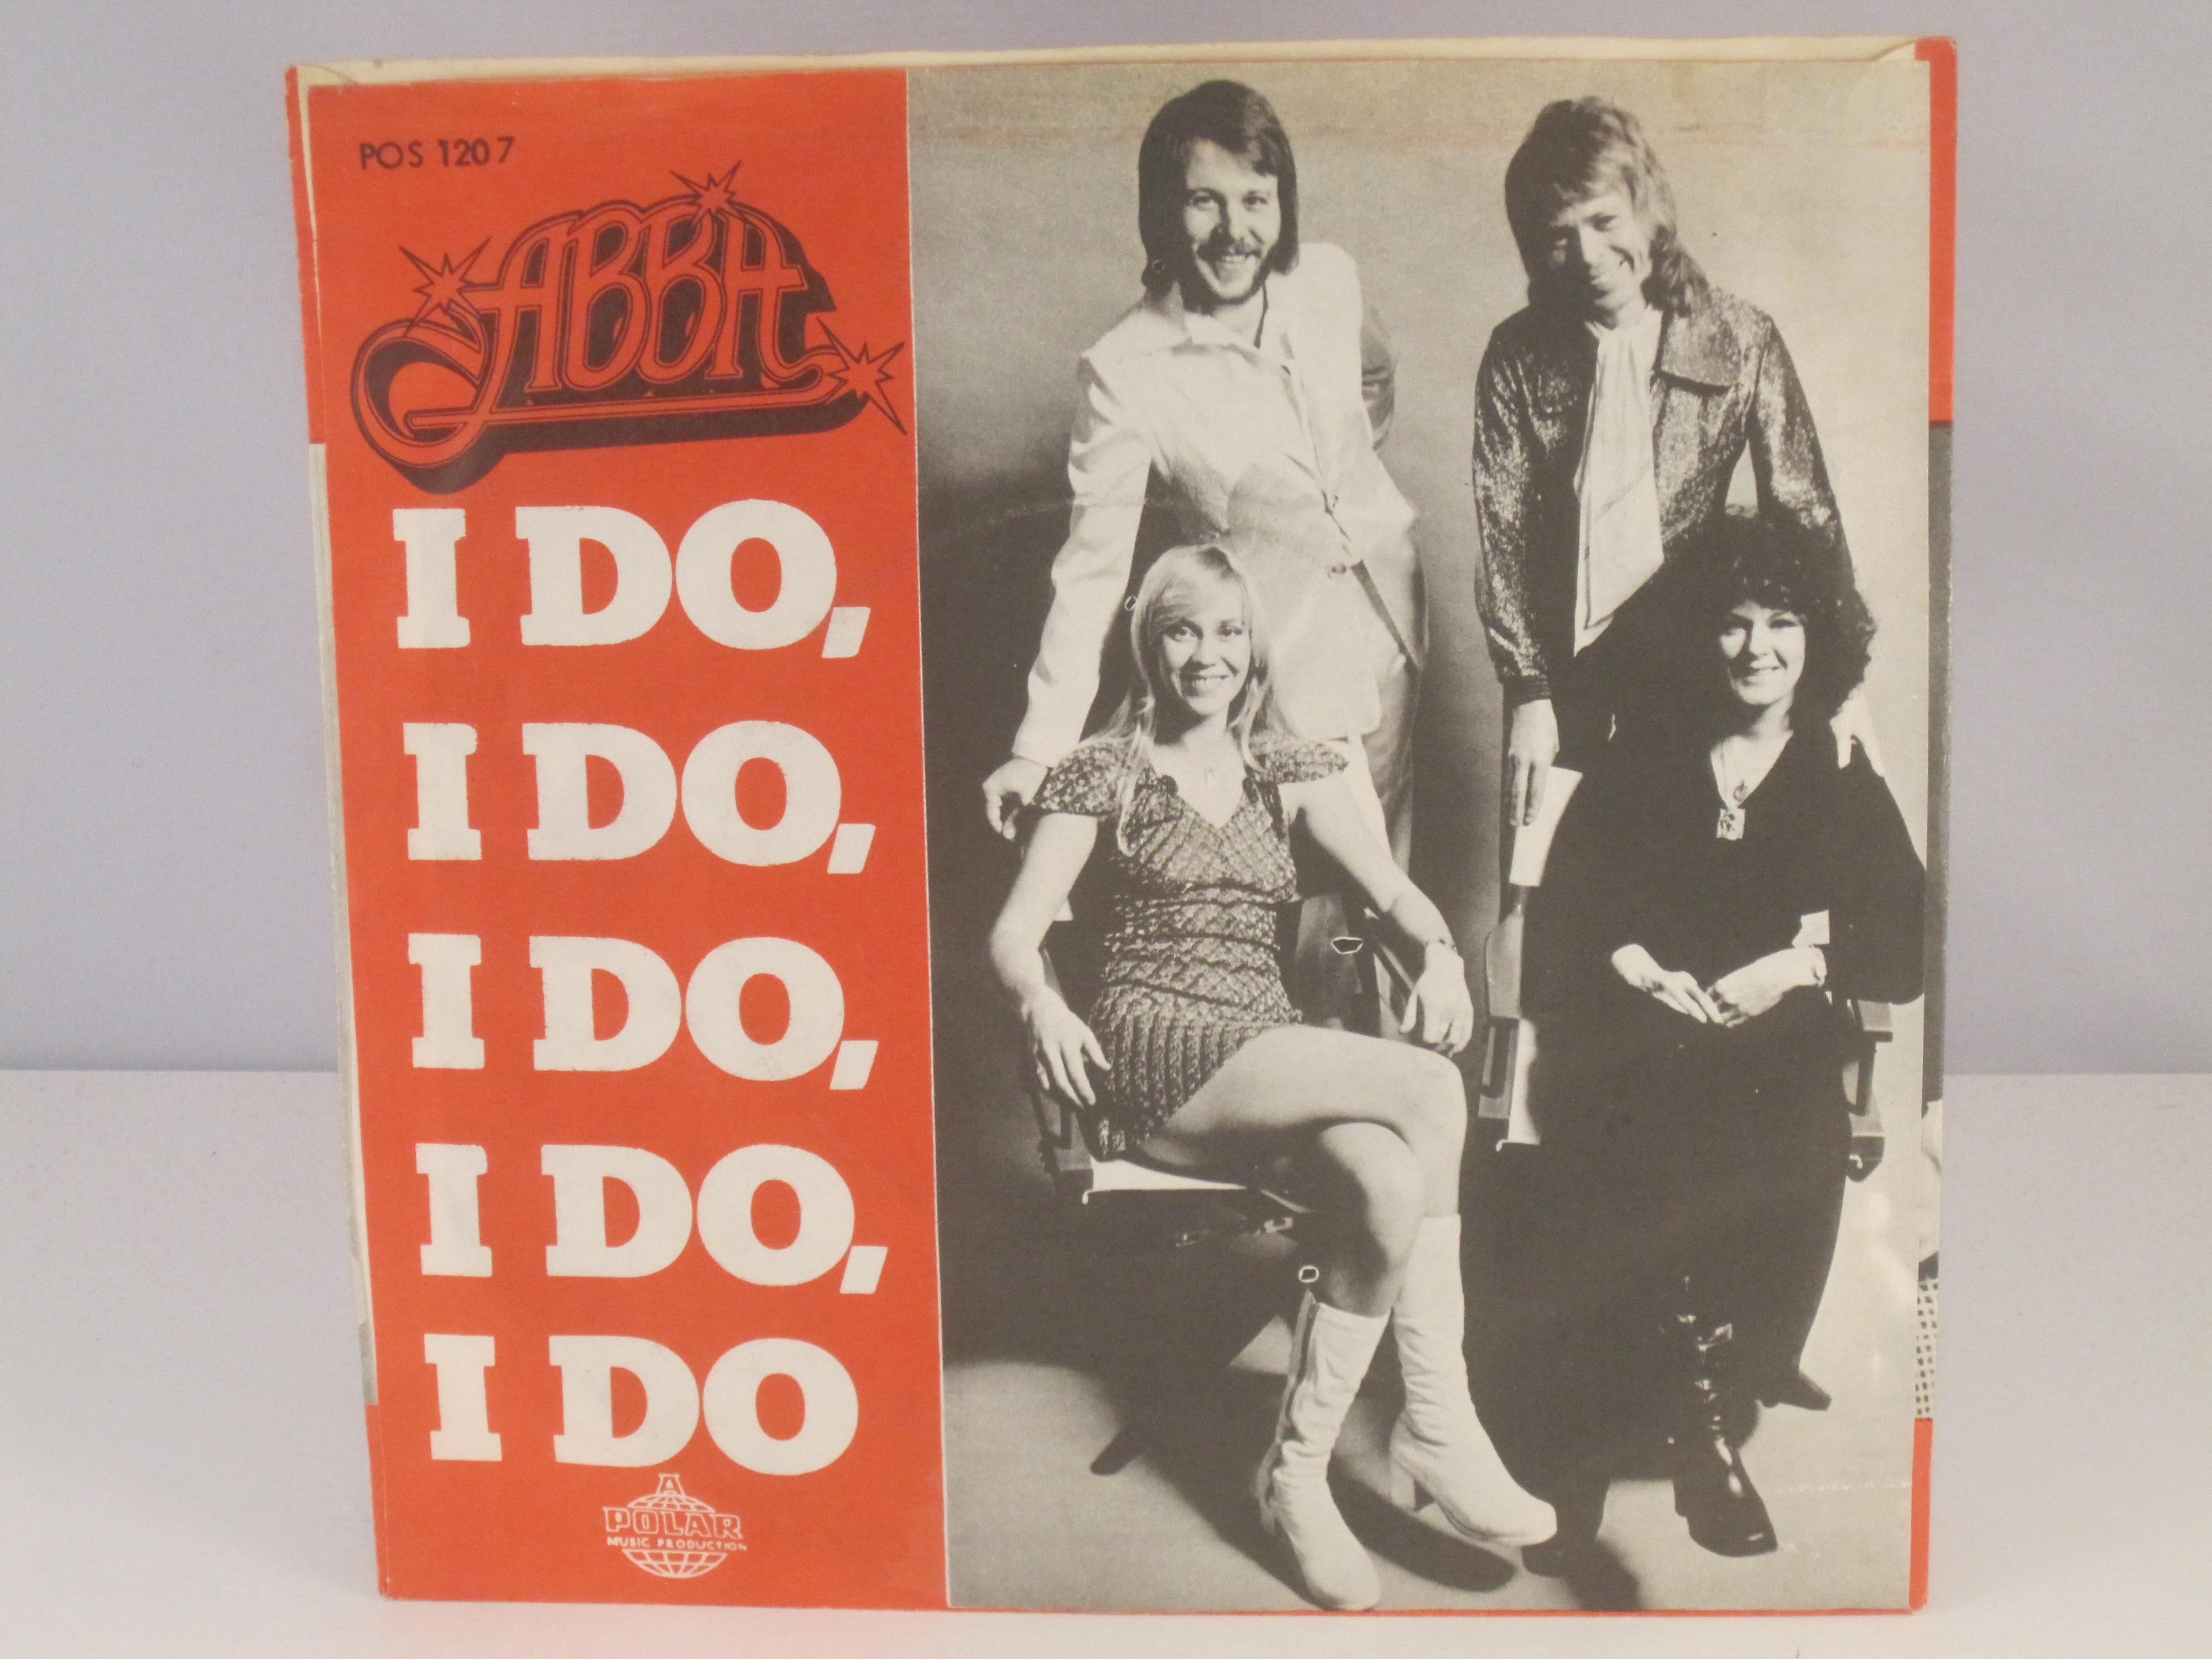 ABBA : I do, I do, I do, I do, I do / Rock me